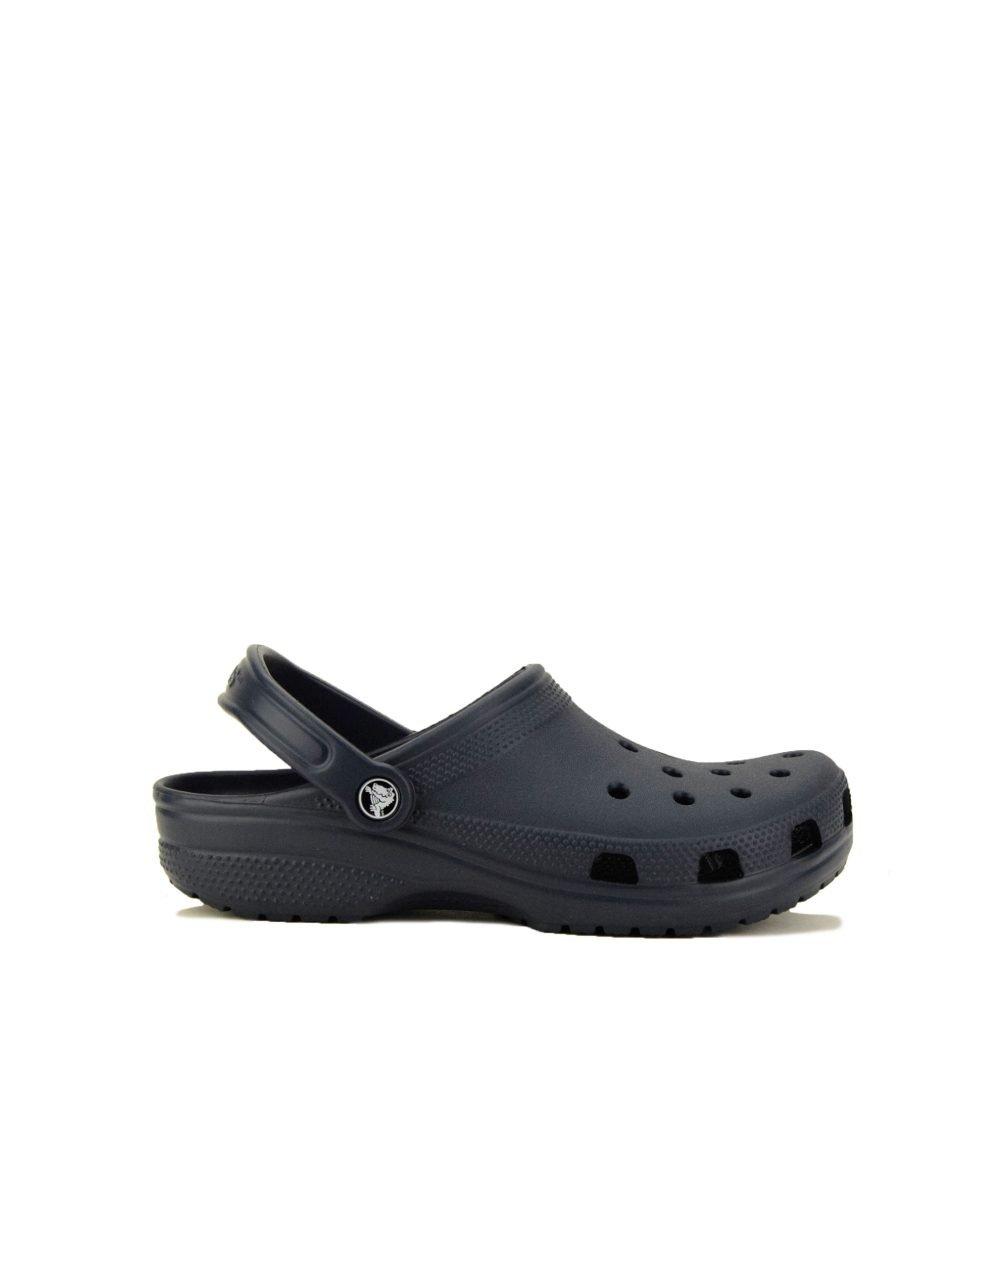 Crocs Classic (10001-410) Navy